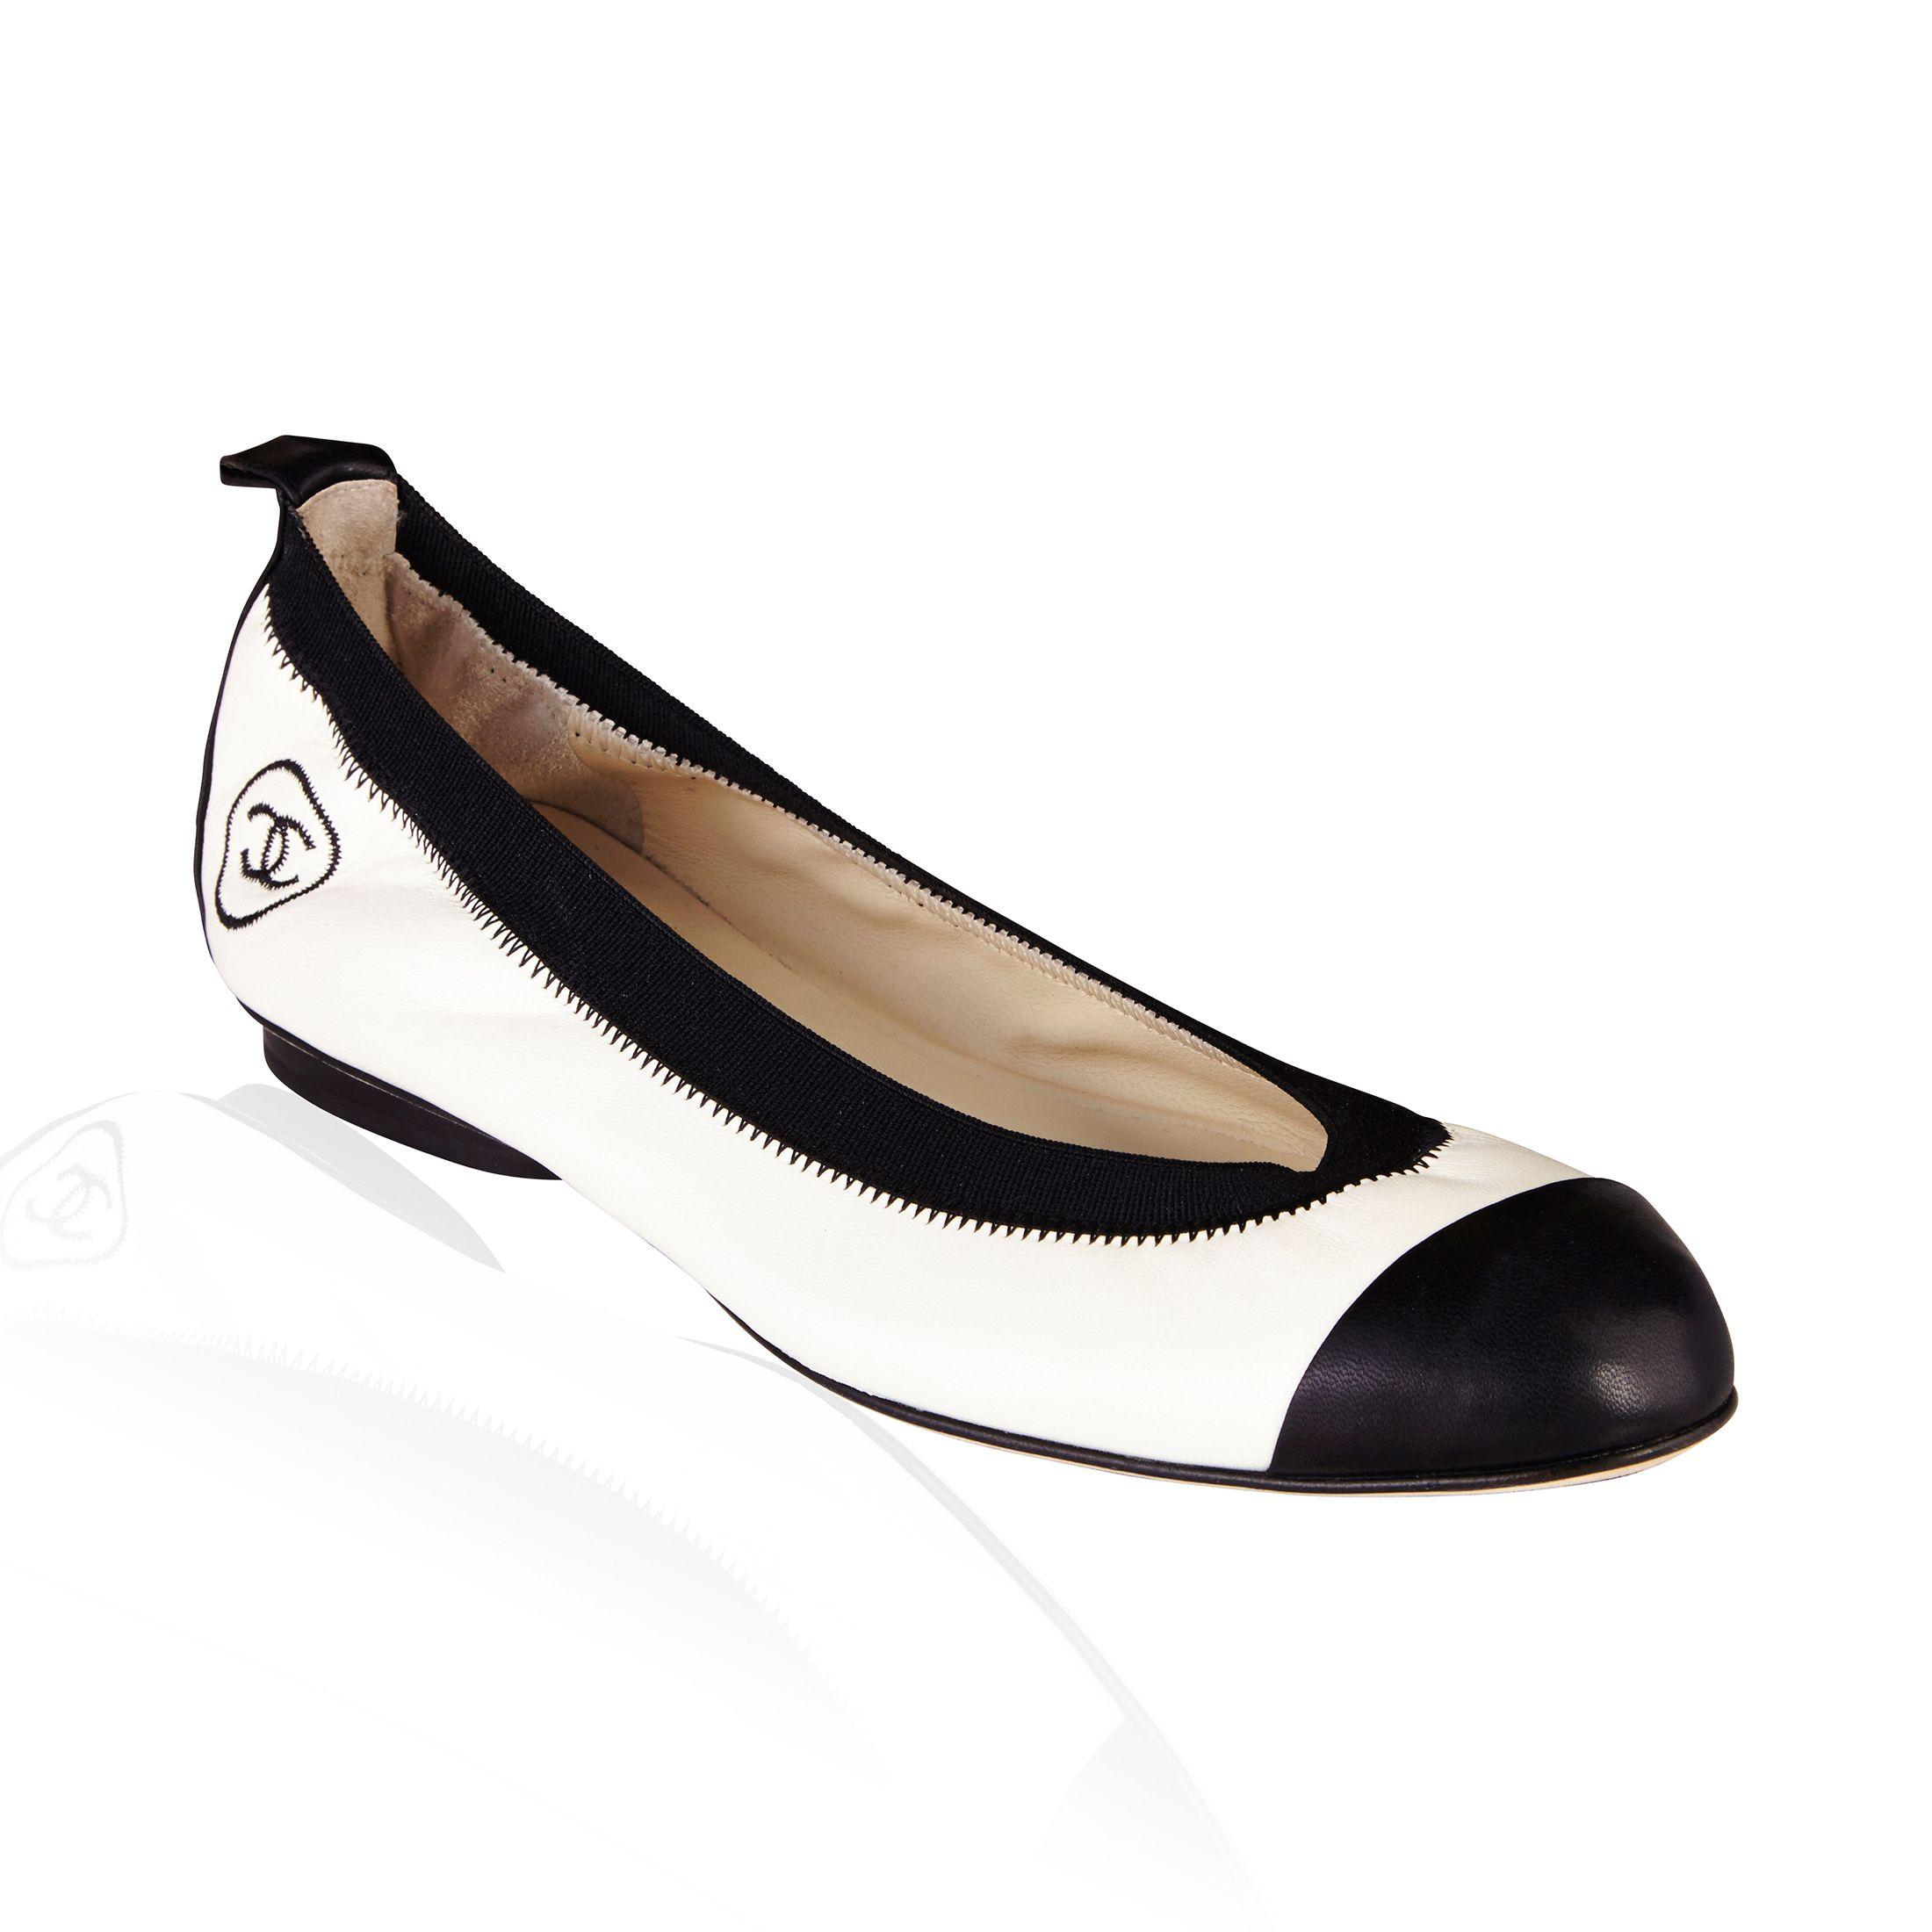 Chanel- White/Black Ballerina Flat Take 25% off $710!